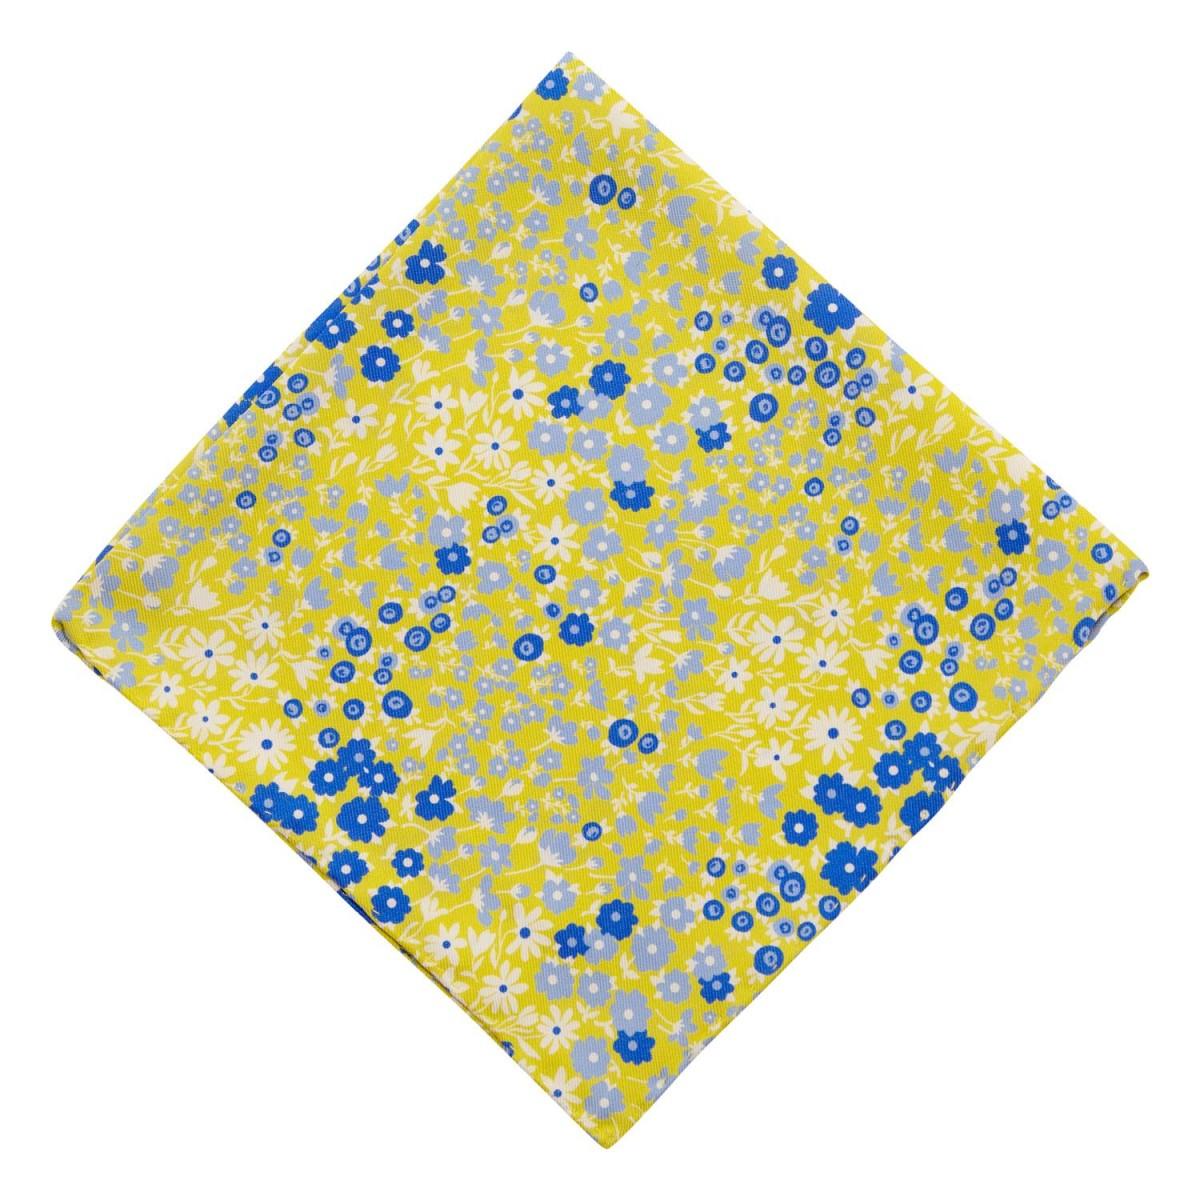 Panuelo-Amarillo-Flores-Azules